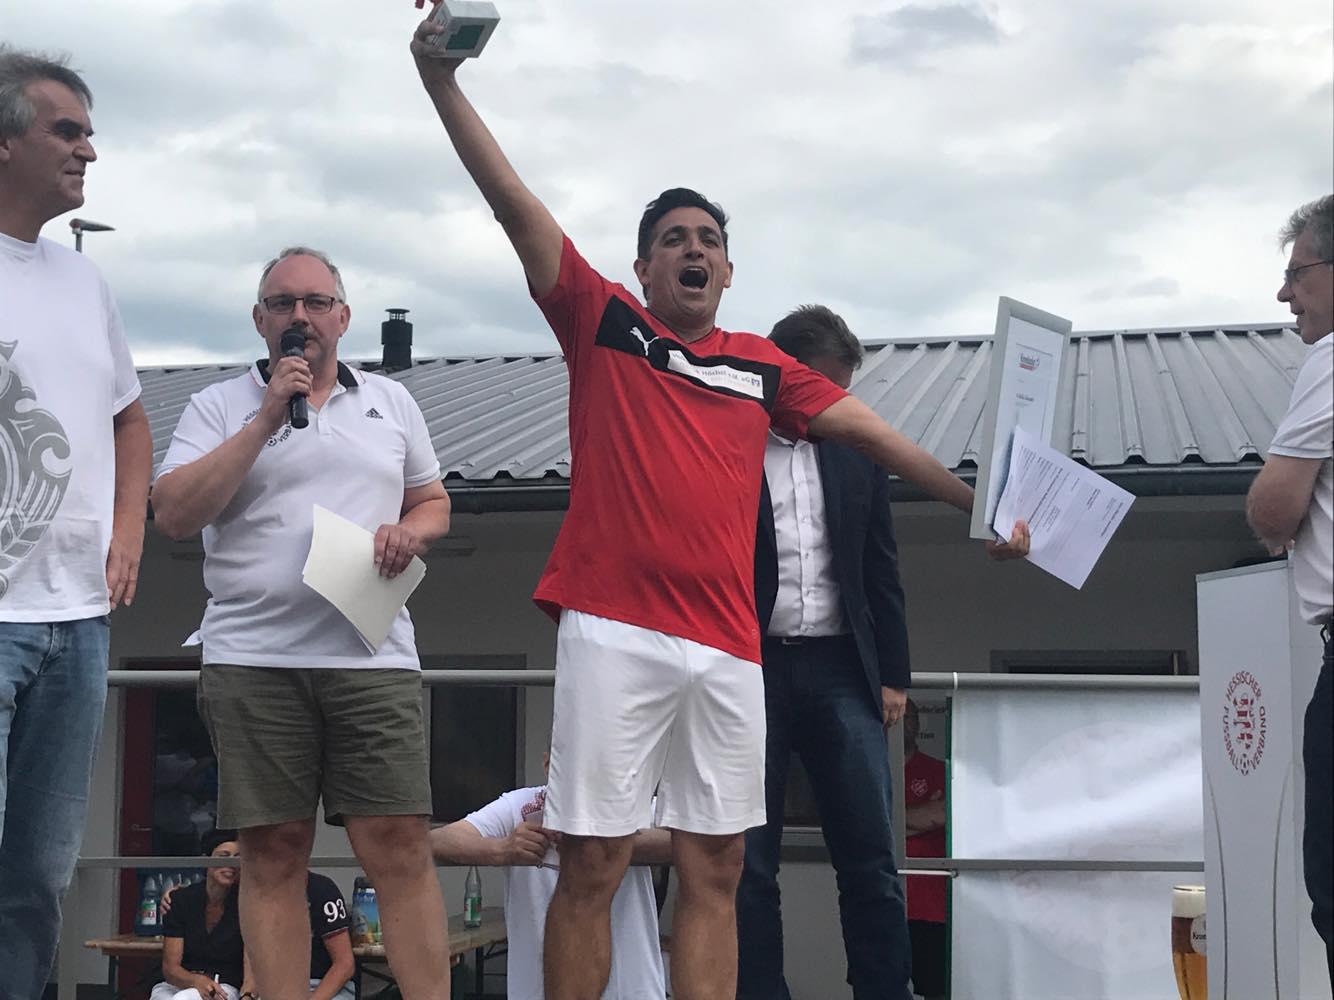 Ü40-CUP SIEGER SG HOECHST CLASSIQUE